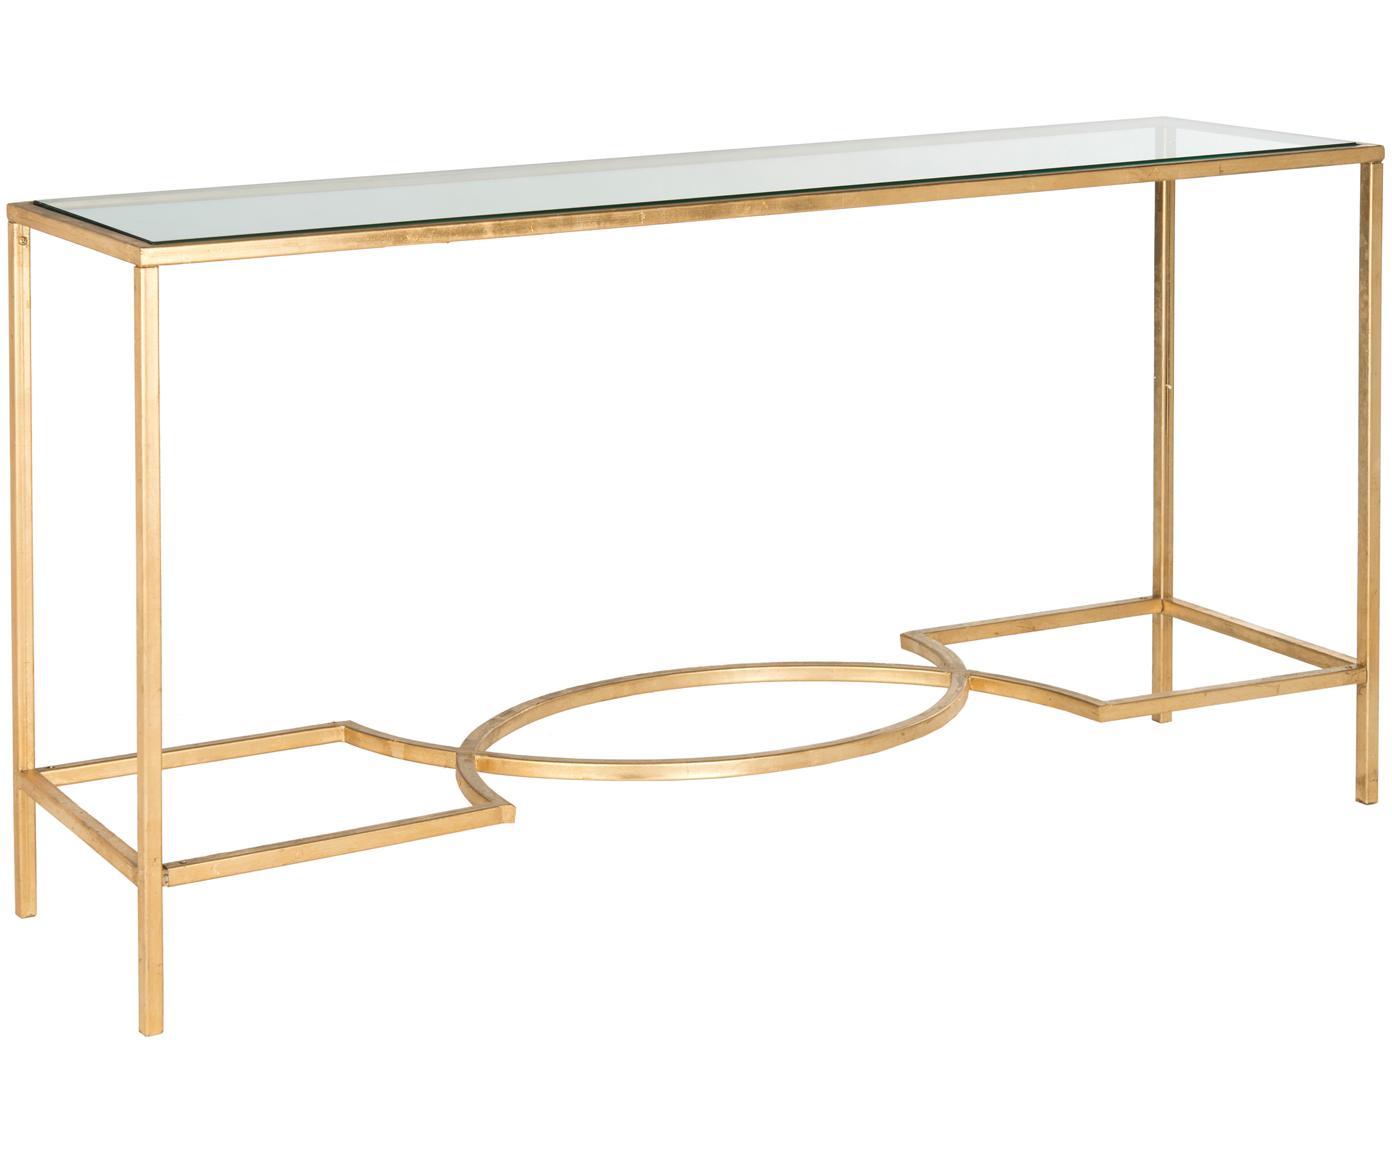 Consola Sia, tablero de cristal, Estructura: hierro, pintado, Tablero: vidrio, Dorado, transparente, An 160 x F 40 cm